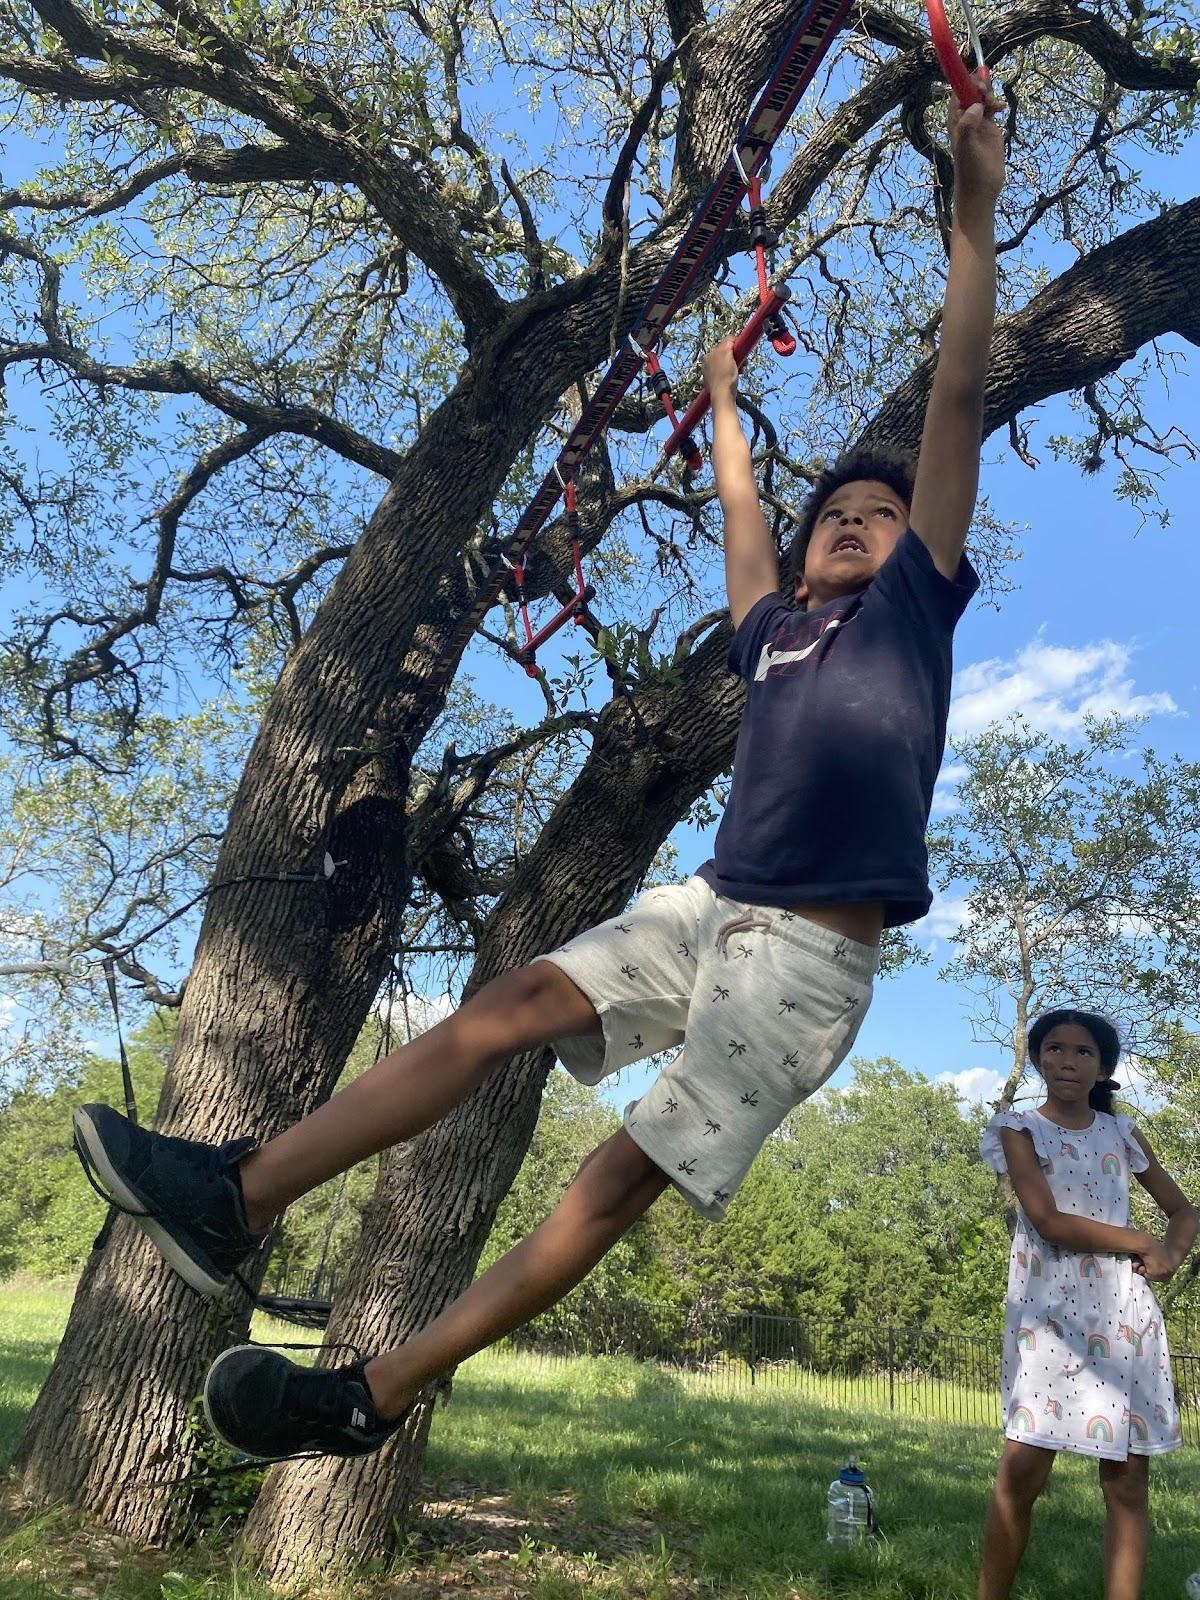 boy swinging across a backyard ninjaline